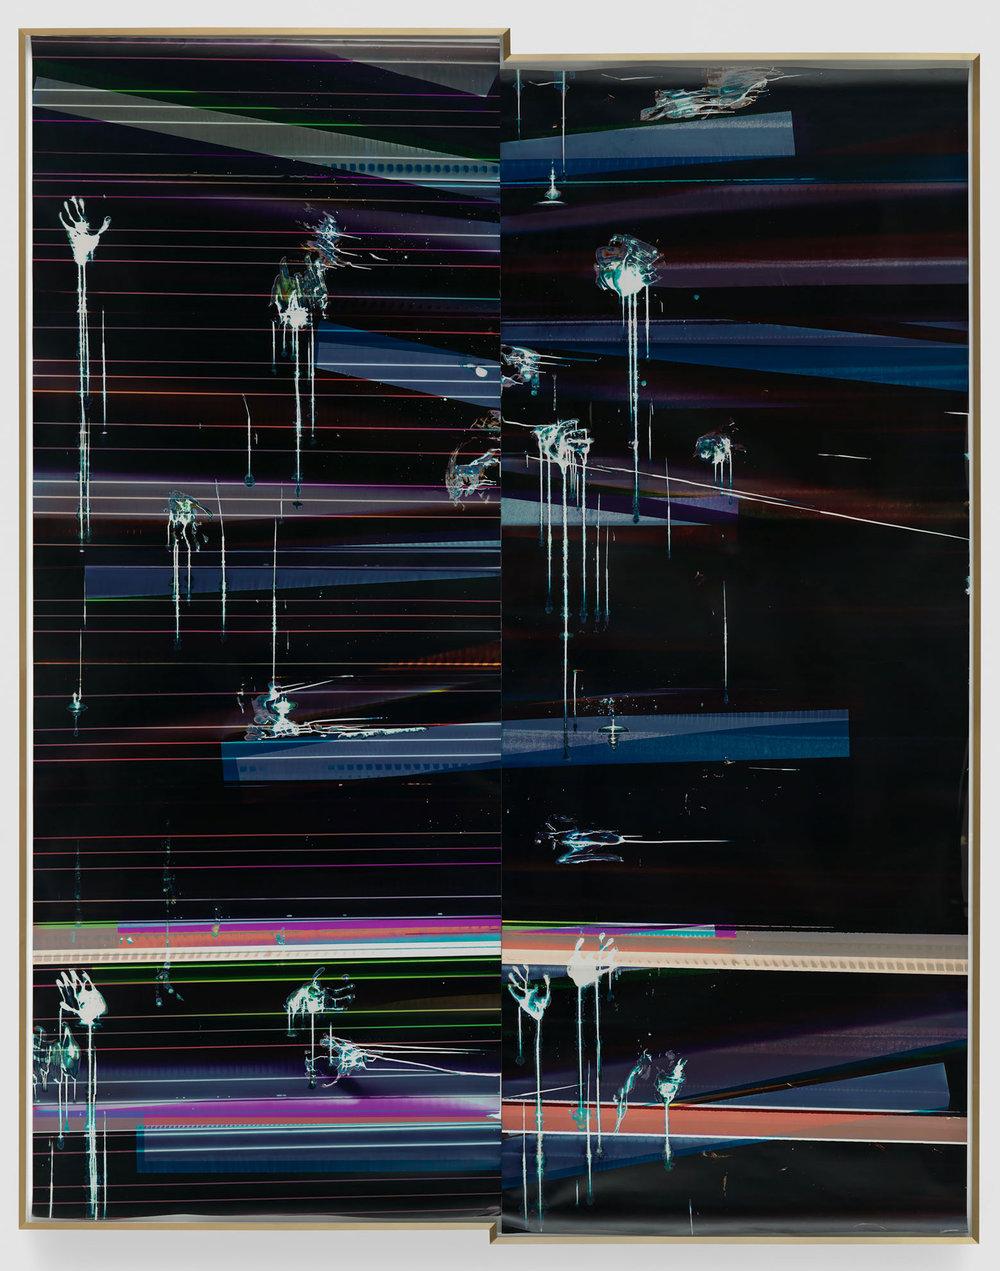 Cross-Contaminated RA4 Contact Print / Processor Stall [Black Curl (MYC/Six Magnet/Six Magnet: Los Angeles, California, March 17, 2016,Fujicolor Crystal Archive Super Type C, Em. No. 112-006, Kodak Ektacolor RA Bleach-Fix and Replenisher, 04716), Kreonite KM IV 5225 RA4 Color Processor, Ser. No. 00092174]    2016   Color photographic paper  125 1/4 x 100 inches   Automat, 2016      Progressive Praxis, 2016